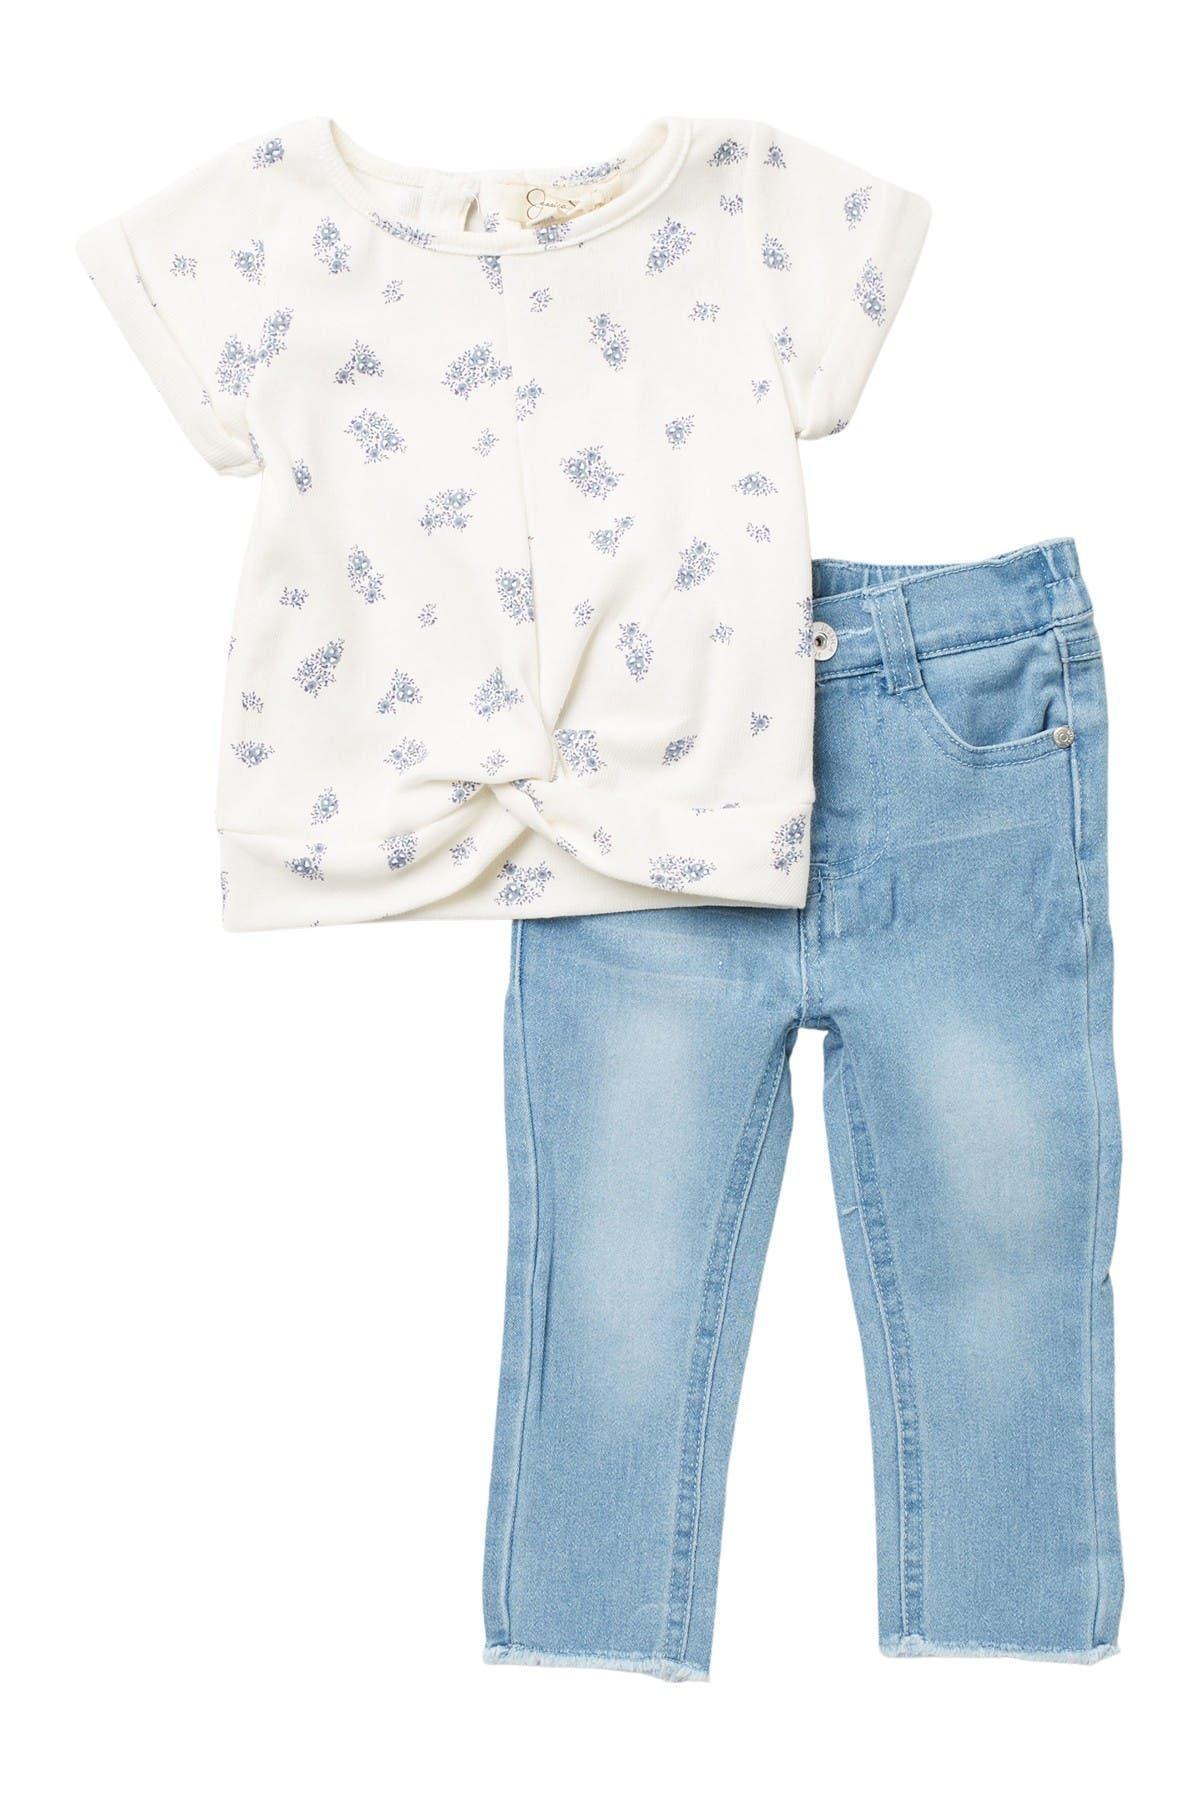 Image of Jessica Simpson Floral Print Top & Denim Pants